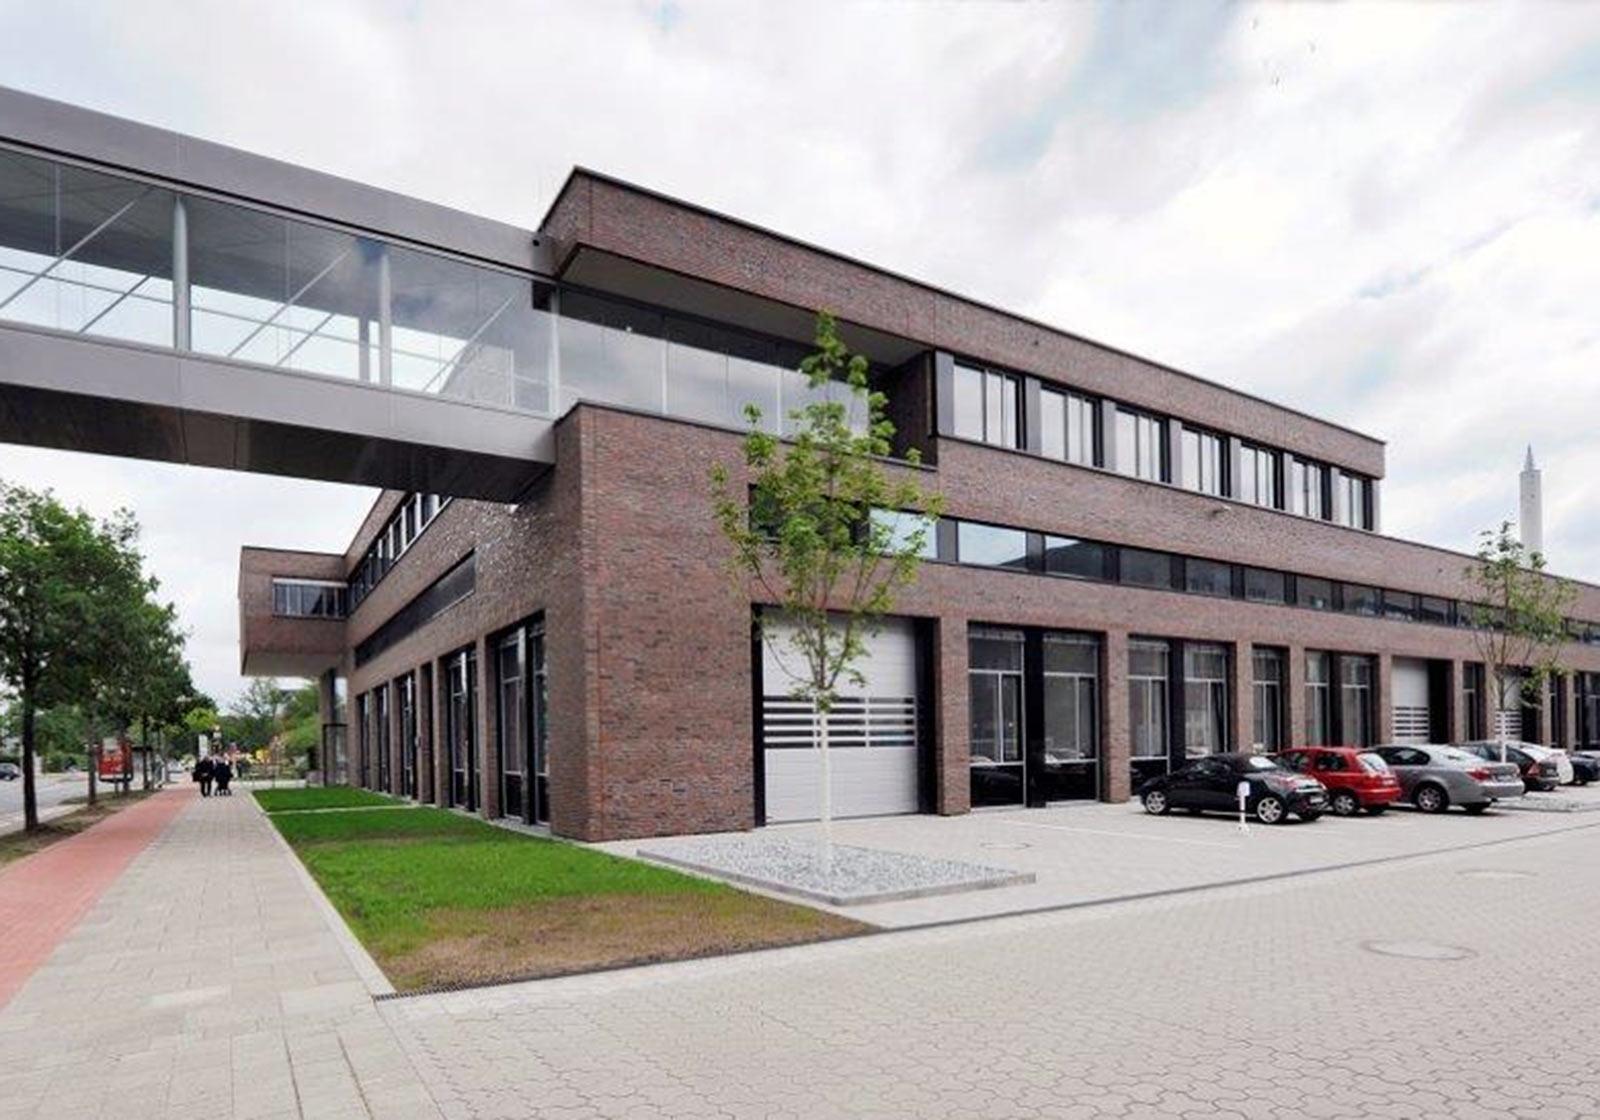 The transparent connecting bridge dovetails into the brick building. Photo: Fraunhofer IFAM